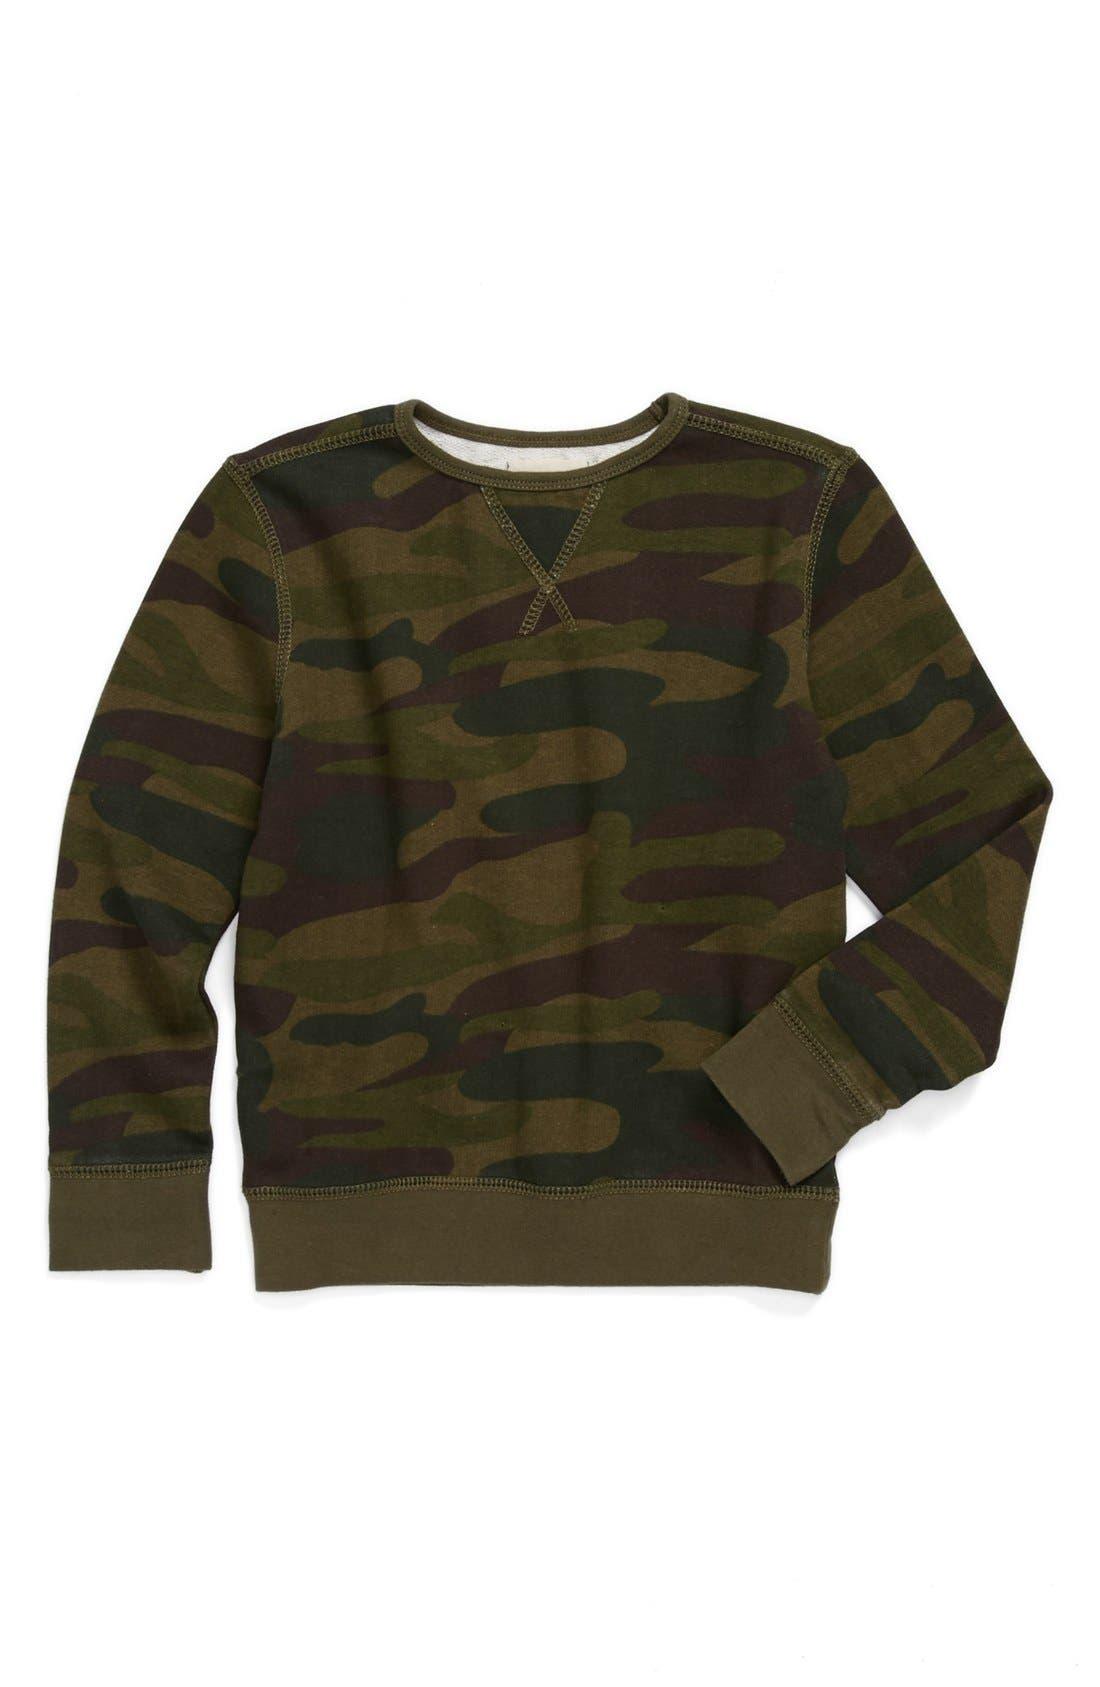 Alternate Image 1 Selected - Peek 'Camo' Sweatshirt (Toddler Boys, Little Boys & Big Boys)